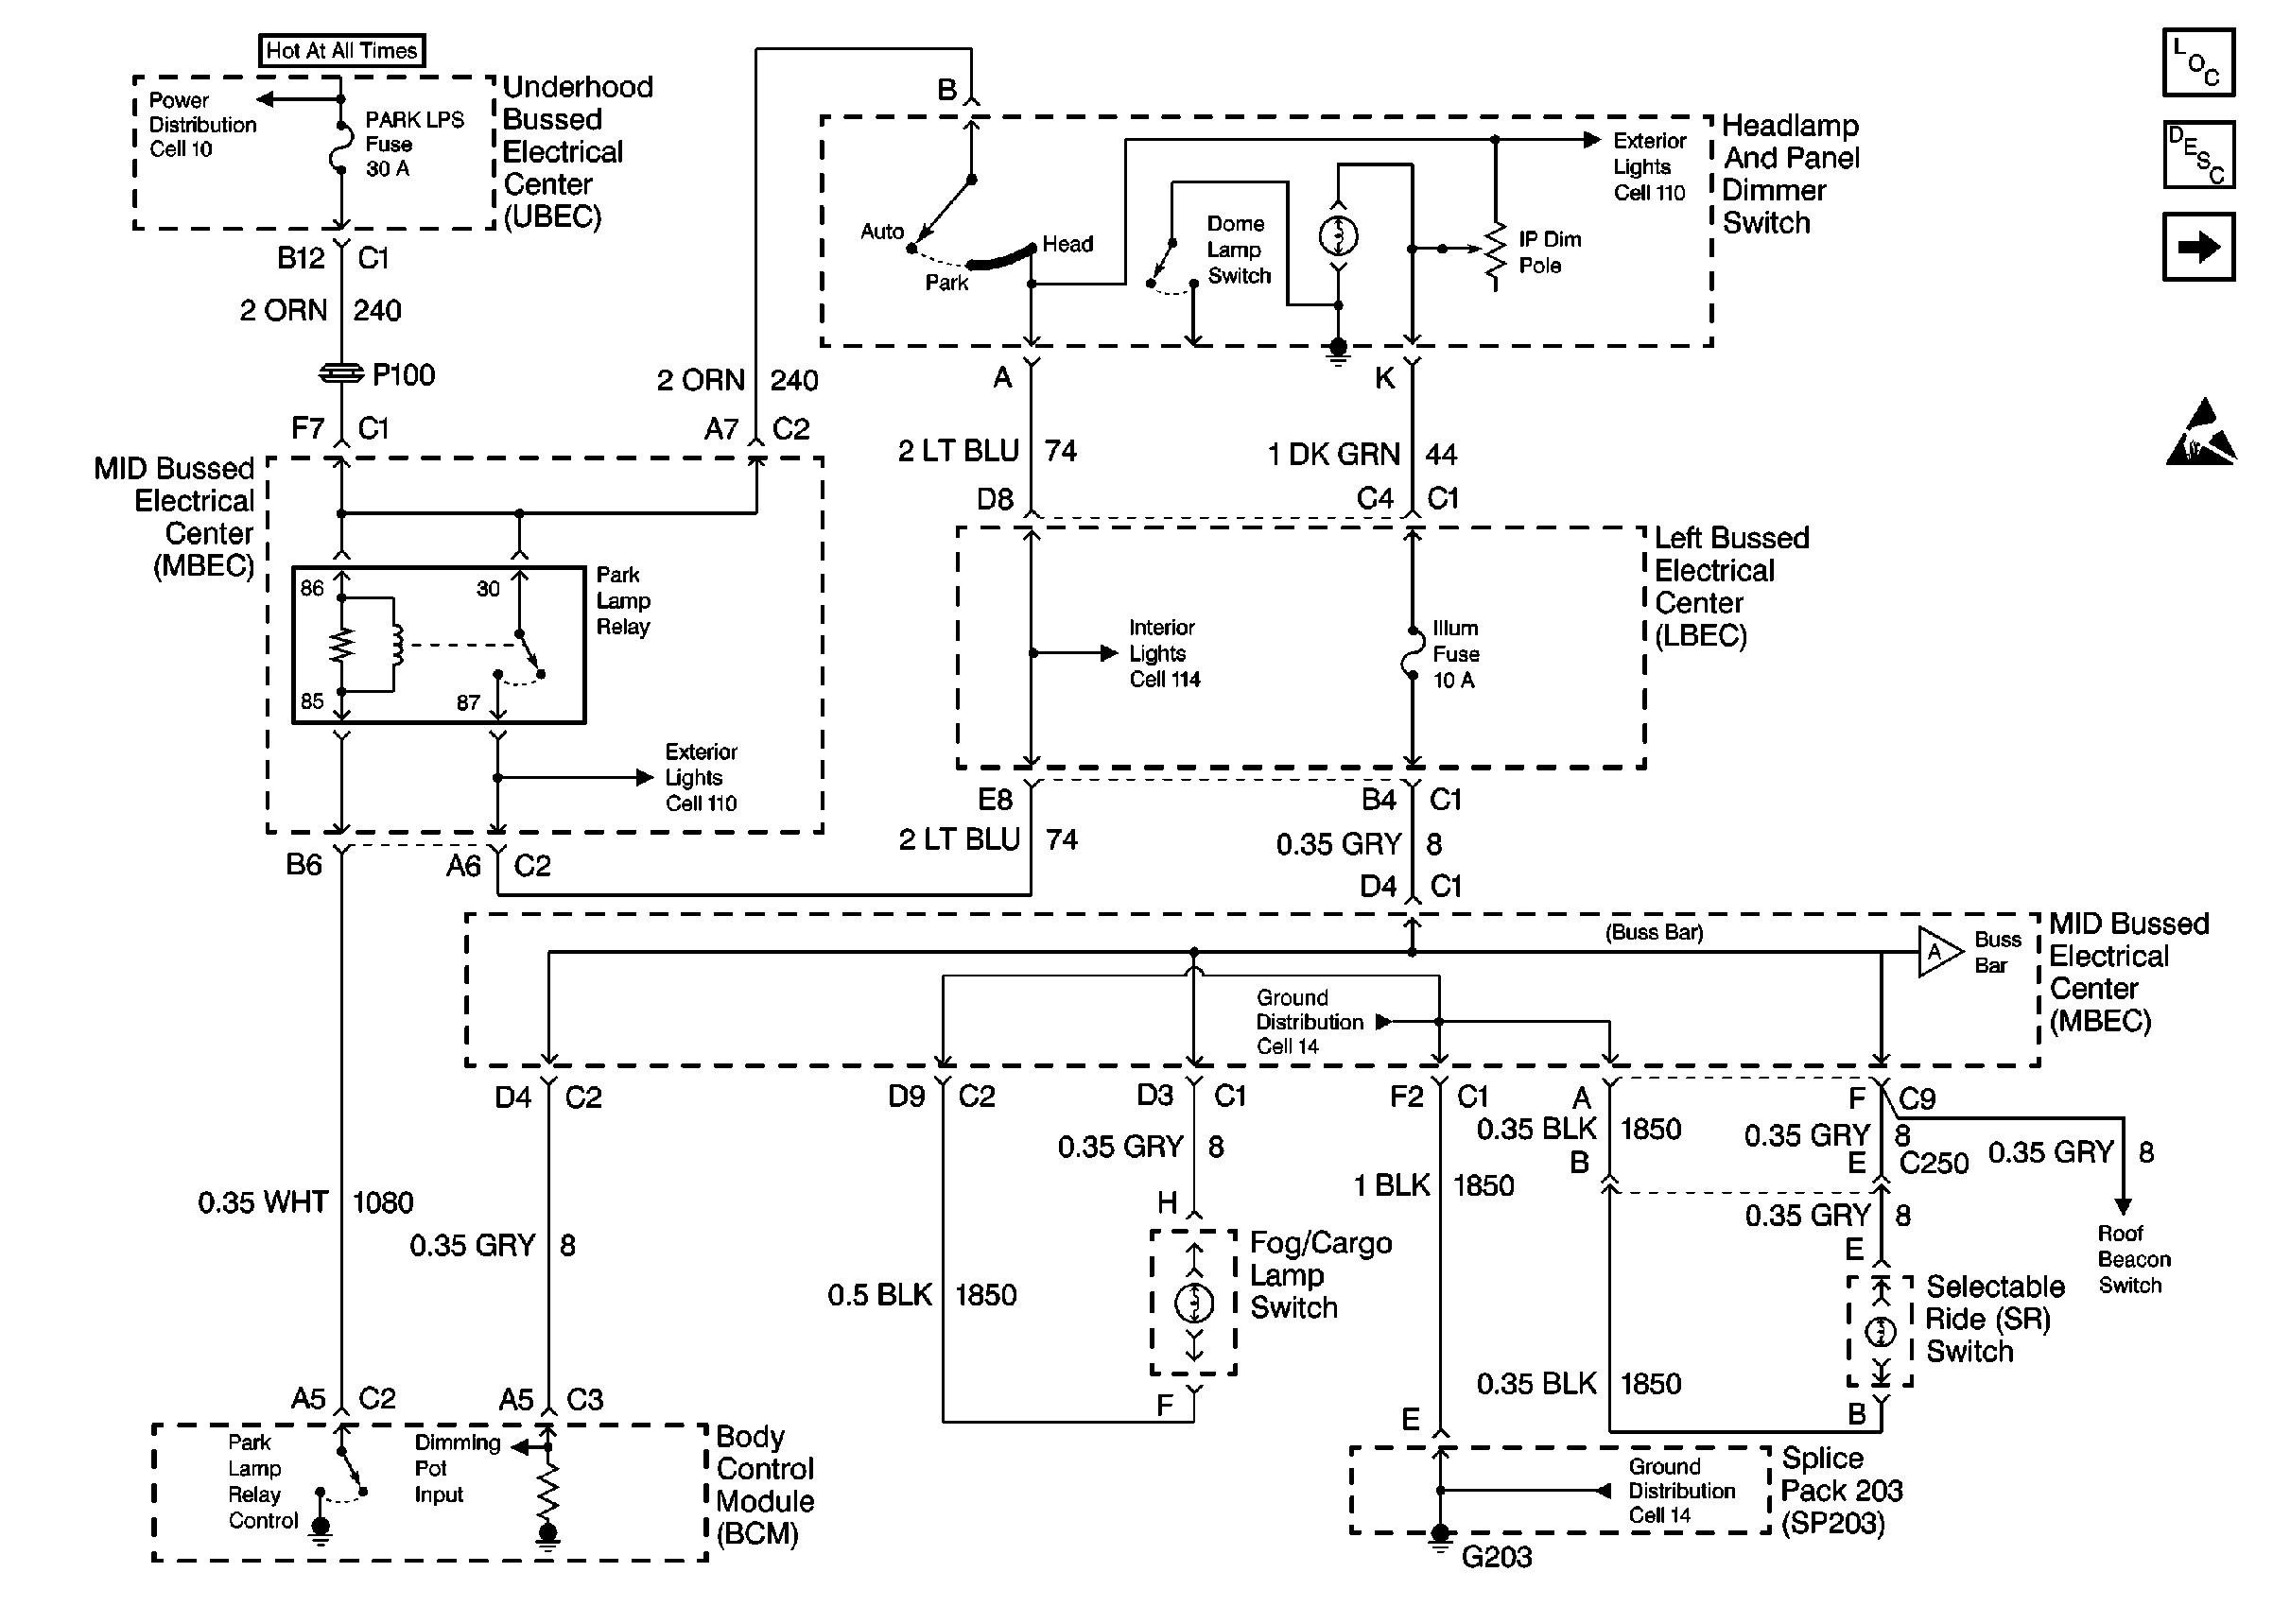 Headlight Switch Wiring Diagram Elegant Headlight Switch Wiring Diagram Chevy Truck Inspirational 2003 Fine